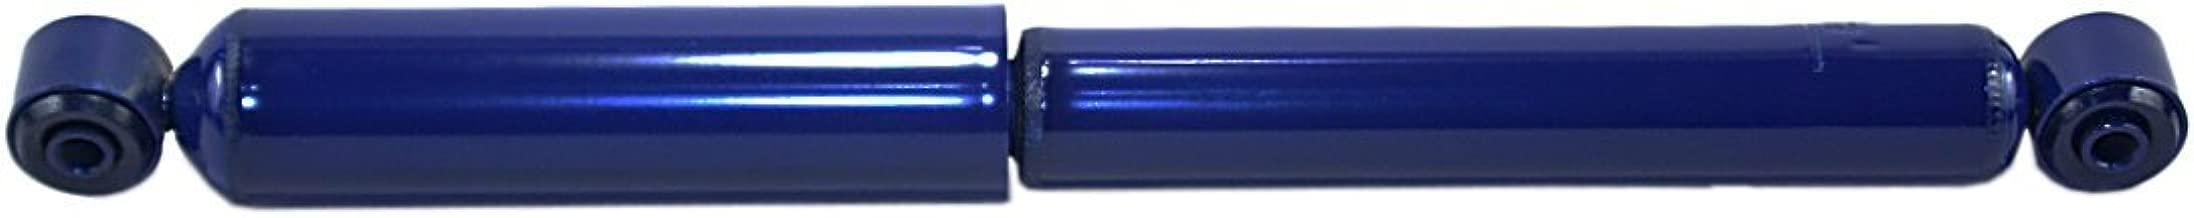 Monroe 32212 Monro-Matic Plus Shock Absorber